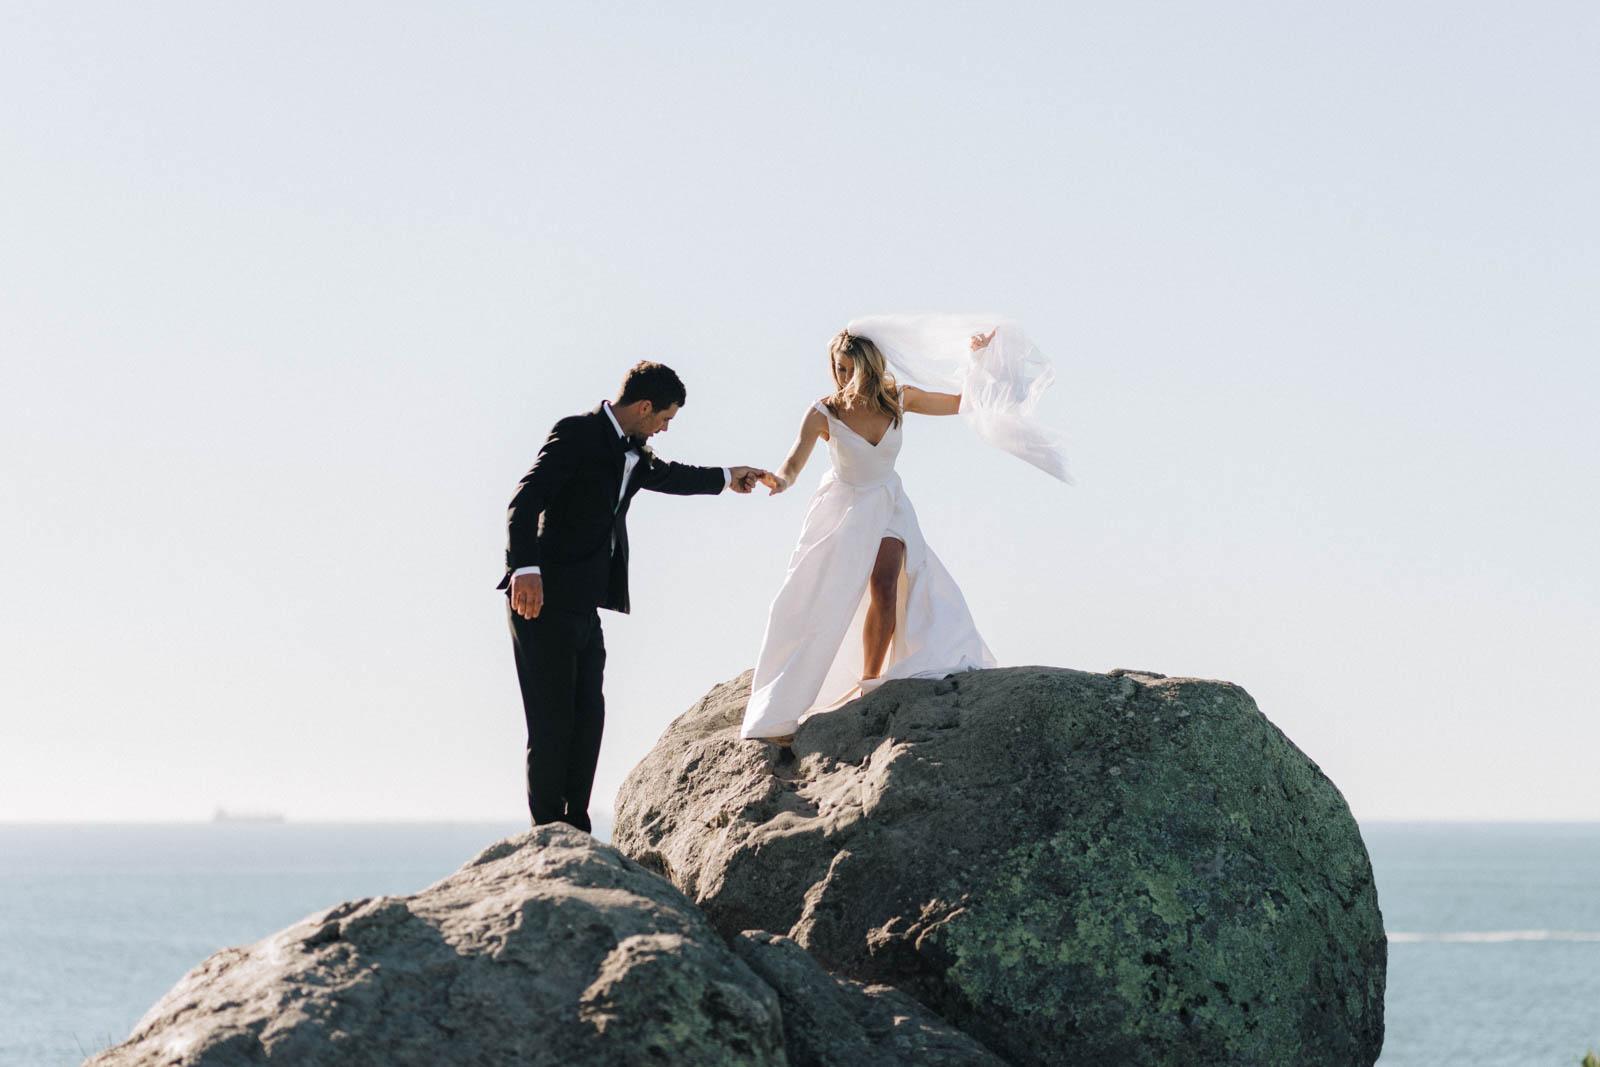 newfound-s-p-mt-maunganui-tauranga-wedding-photographer-1550-A9_05535